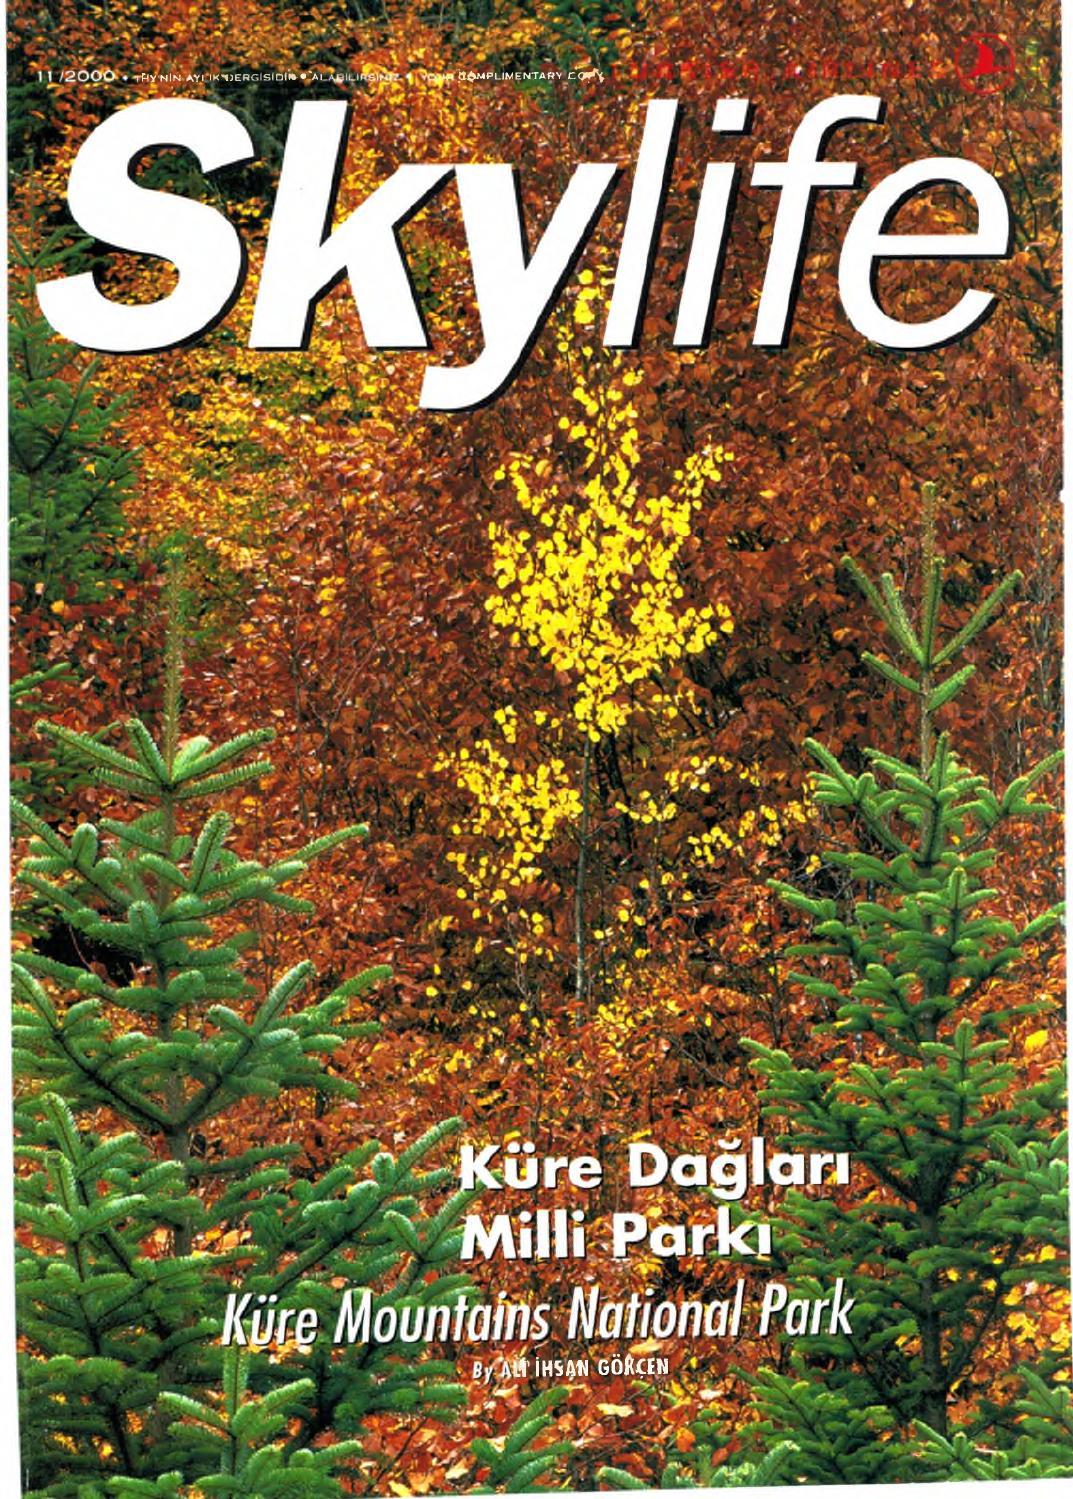 Sonbaharda Doğa: Bir dizi inanılmaz metamorfoz